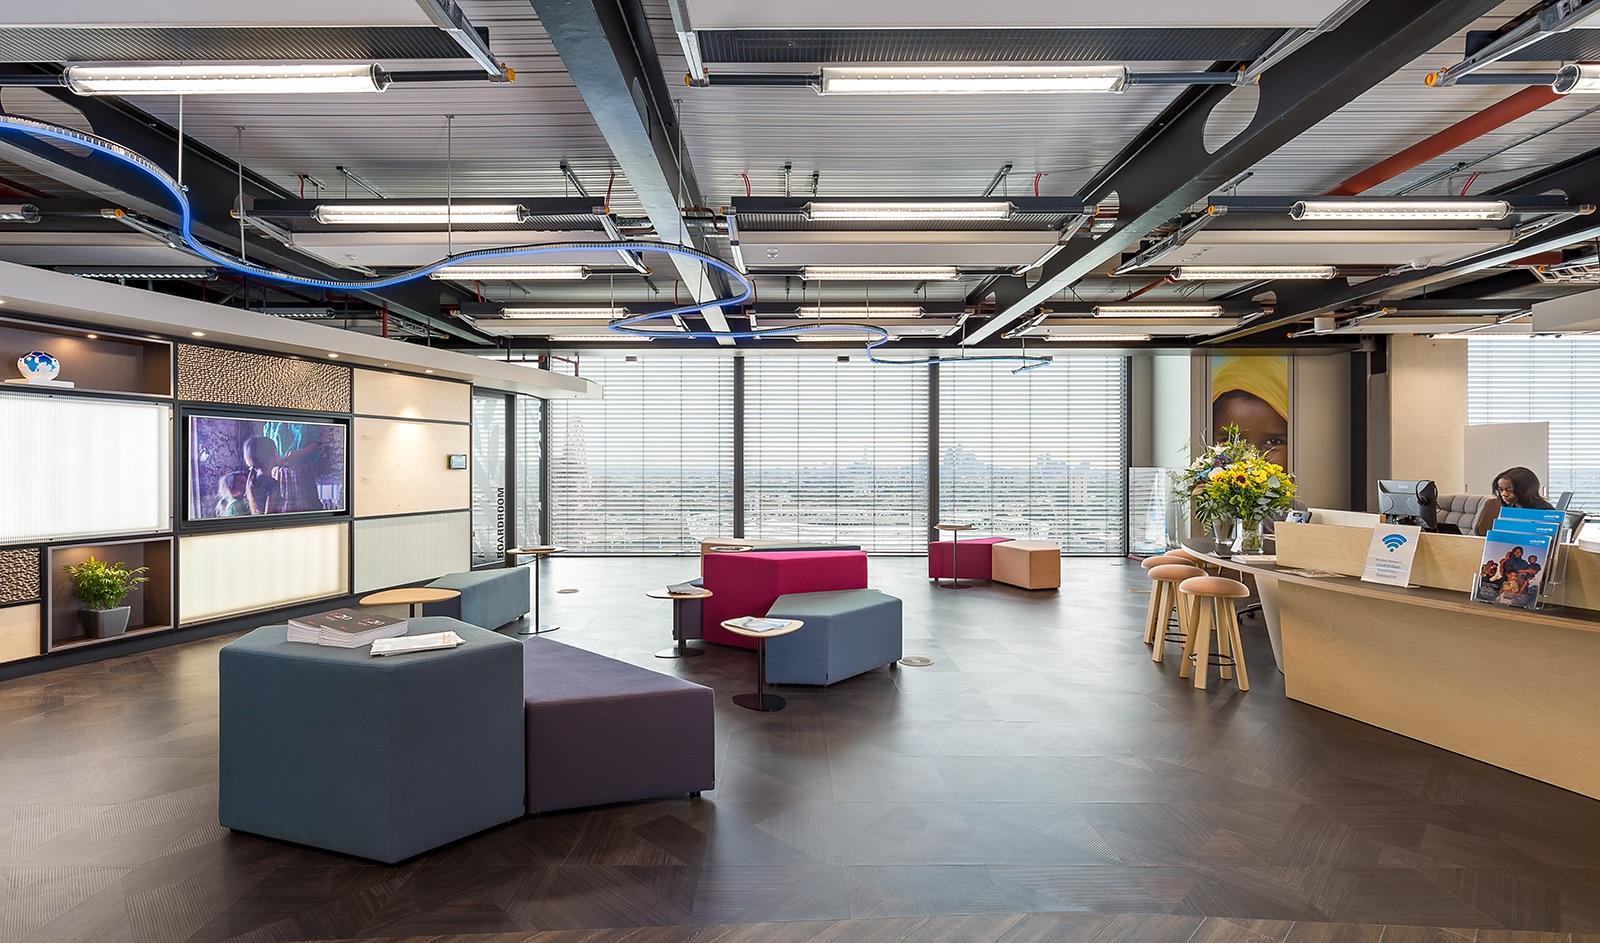 unicef-london-office-3